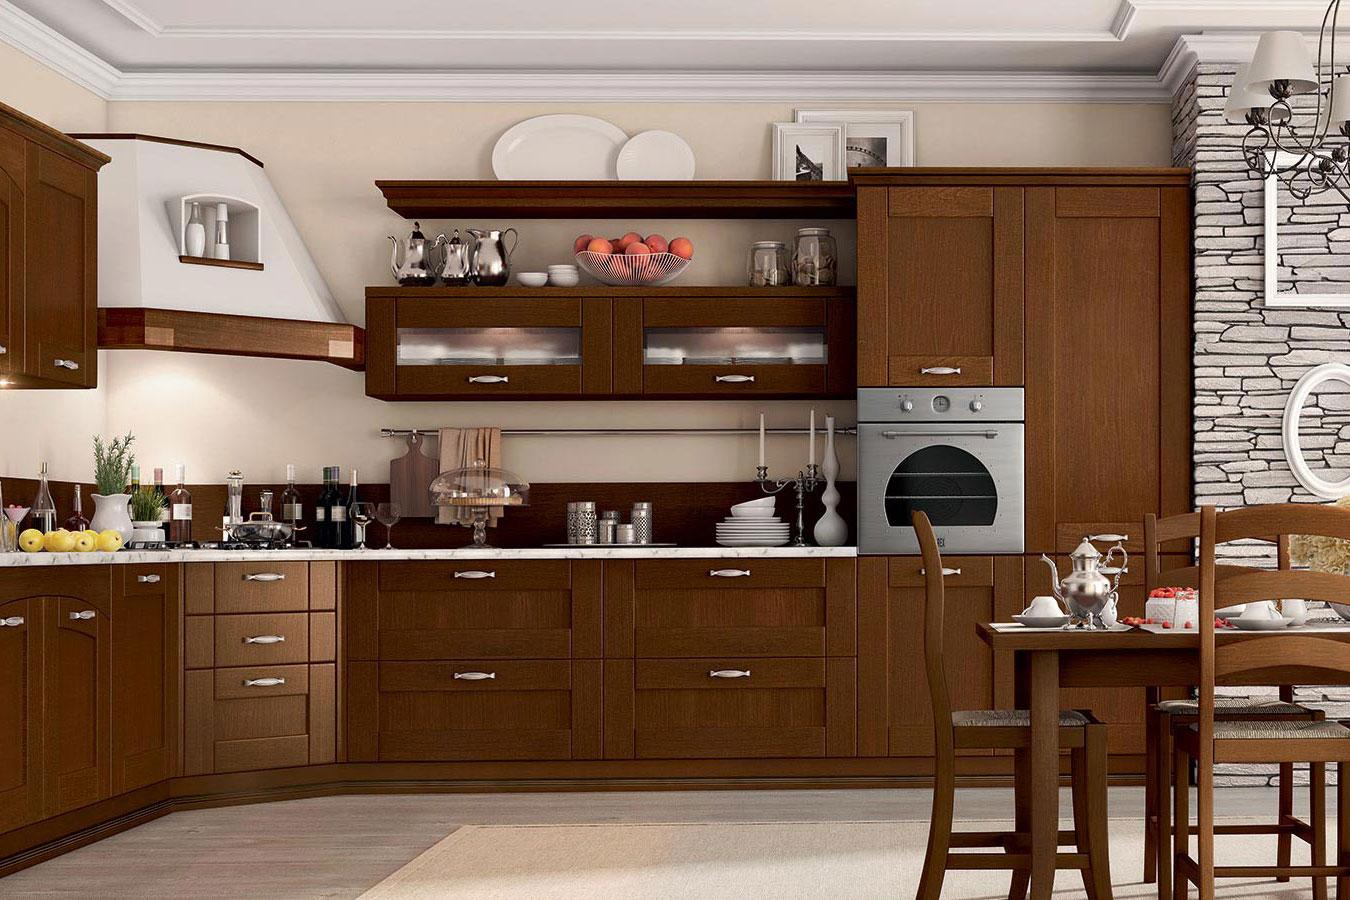 Beautiful Arredo Cucina Classica Ideas - Acomo.us - acomo.us